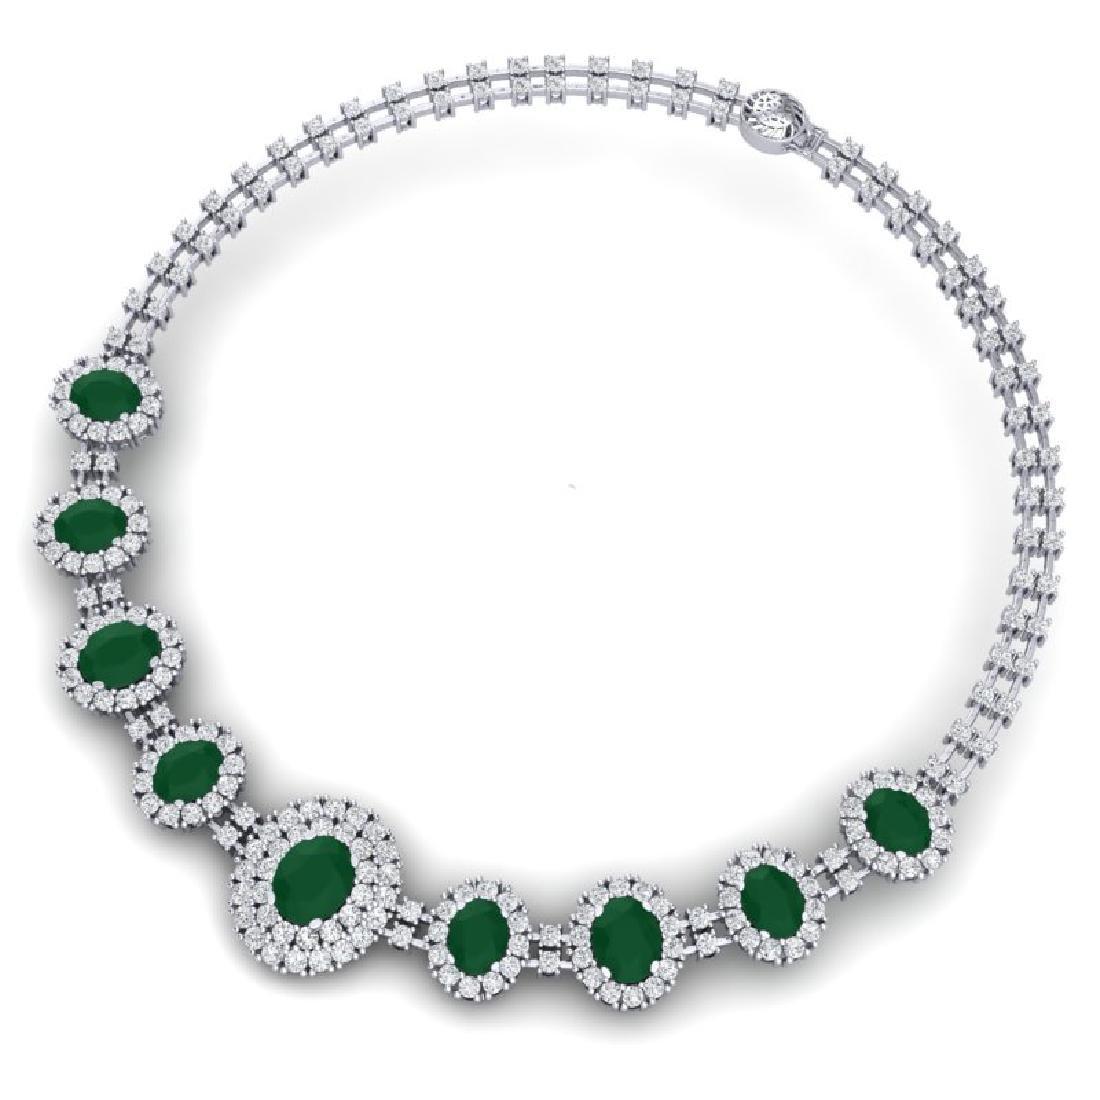 45.69 CTW Royalty Emerald & VS Diamond Necklace 18K - 2